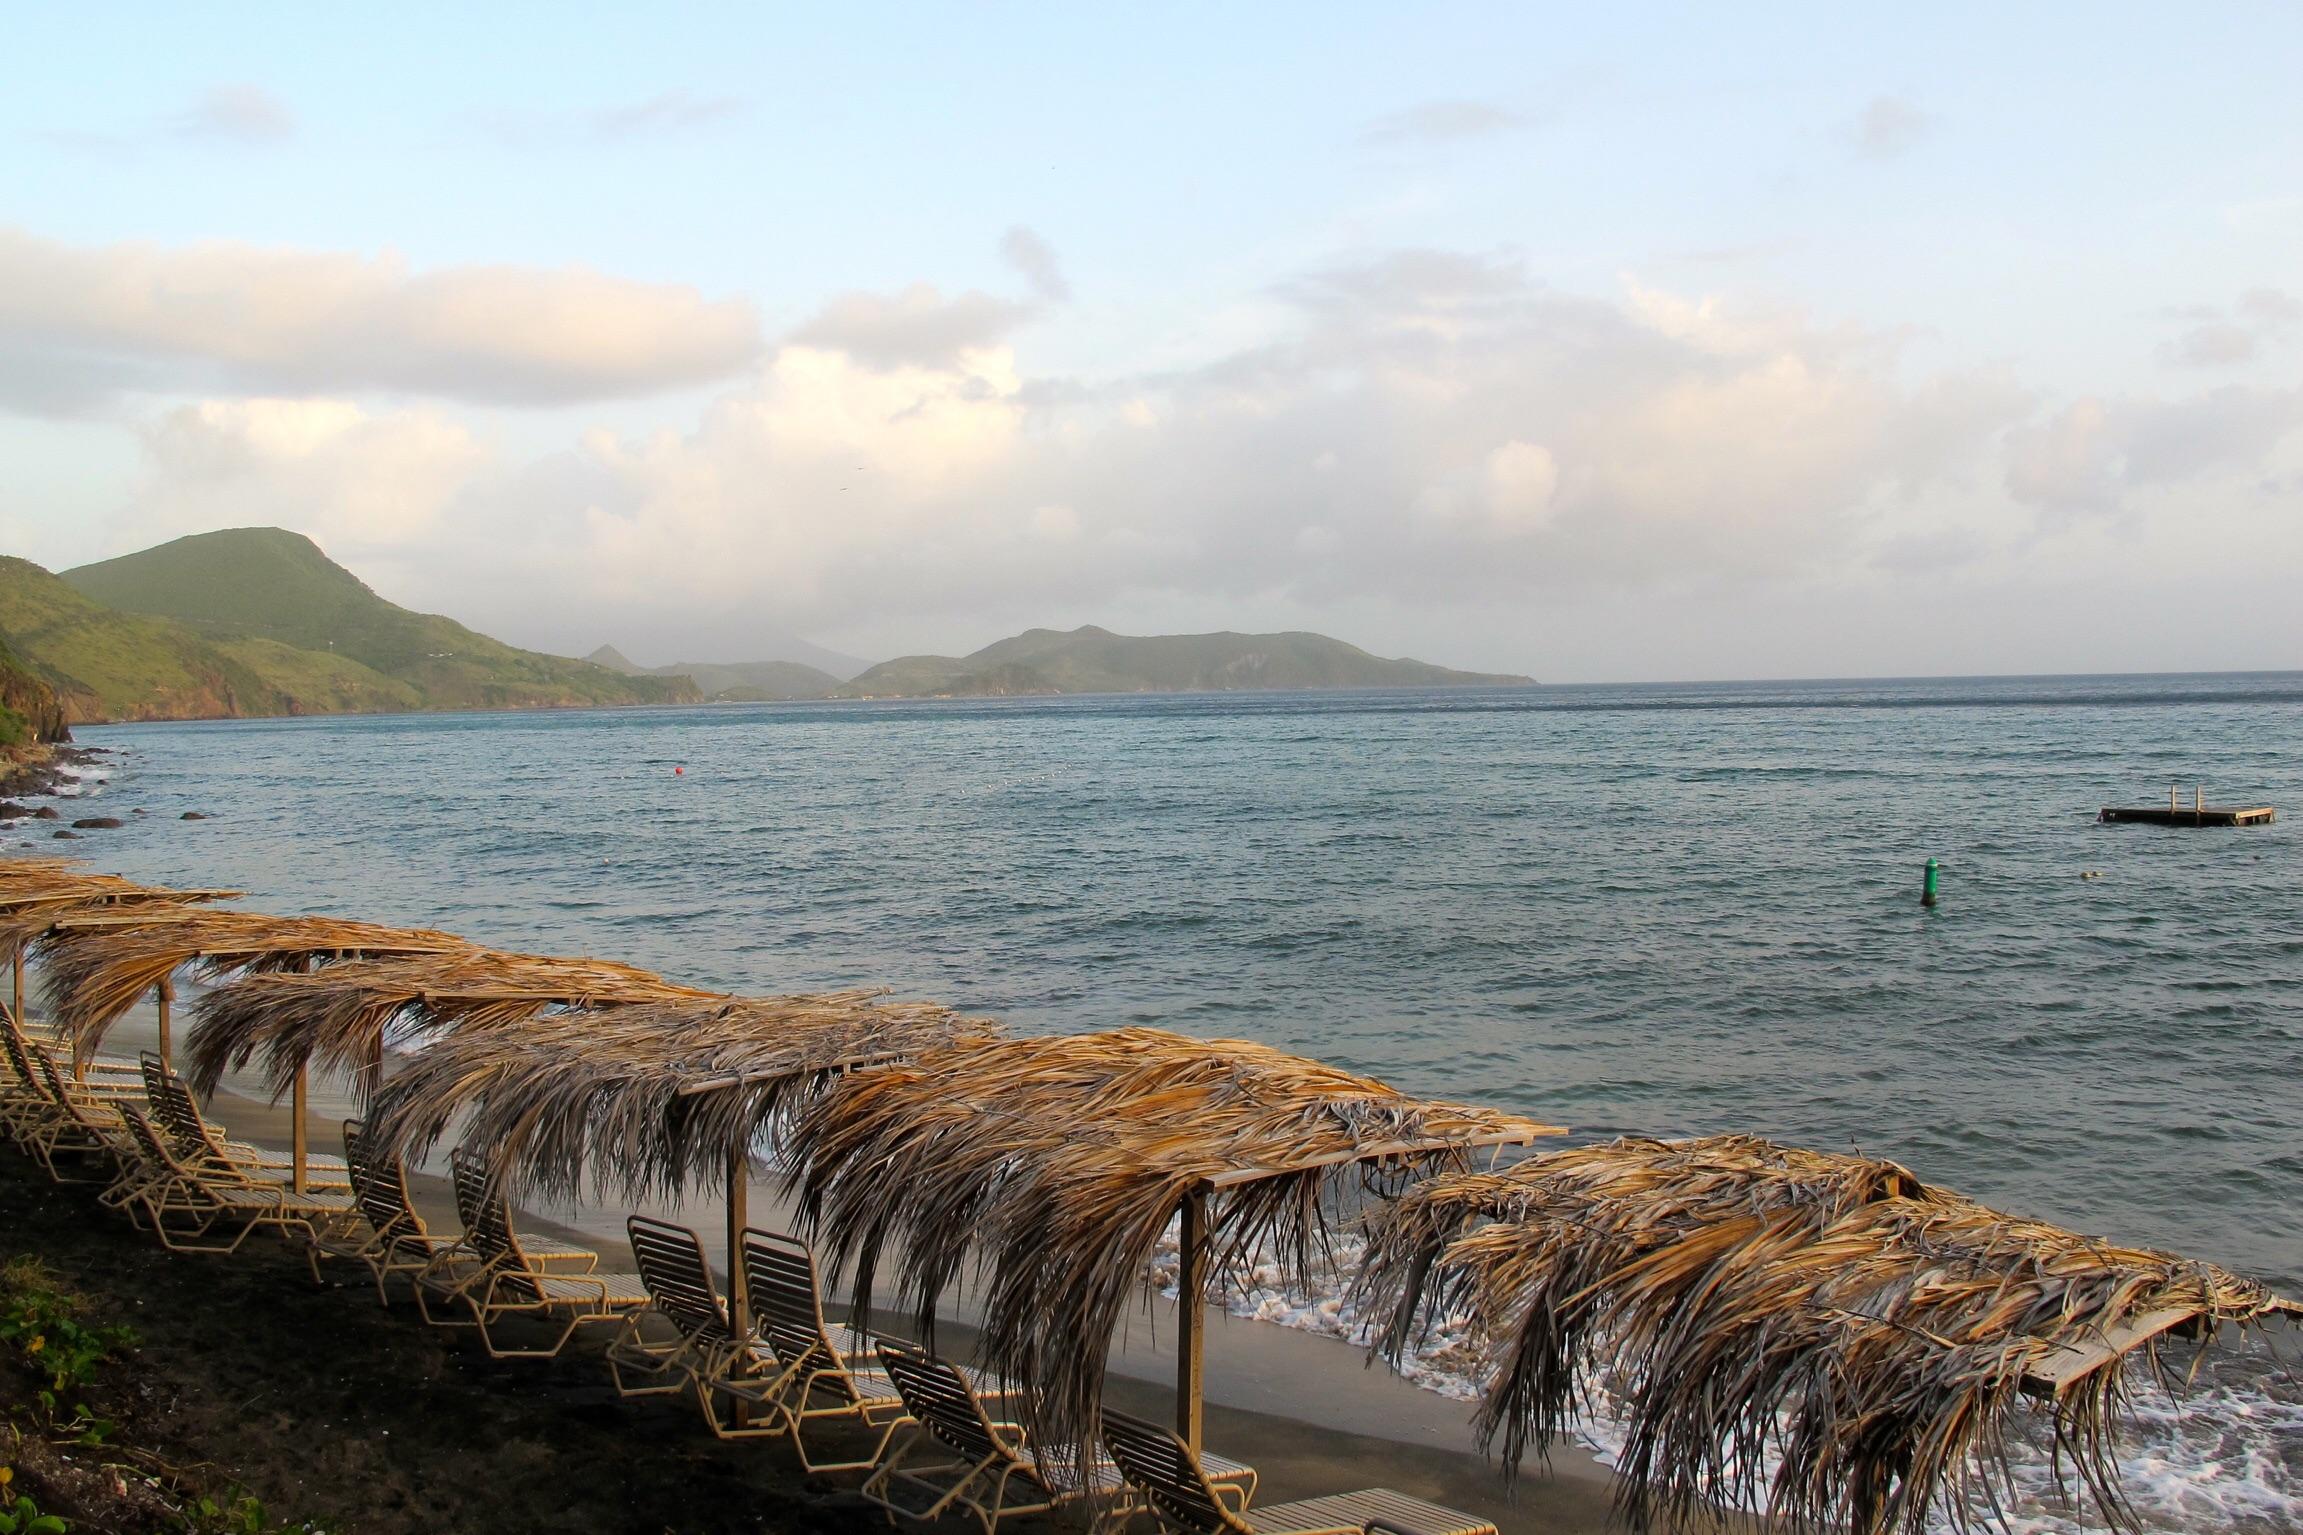 Shipwreck Bar & Grill, St. Kitts, Caribbean